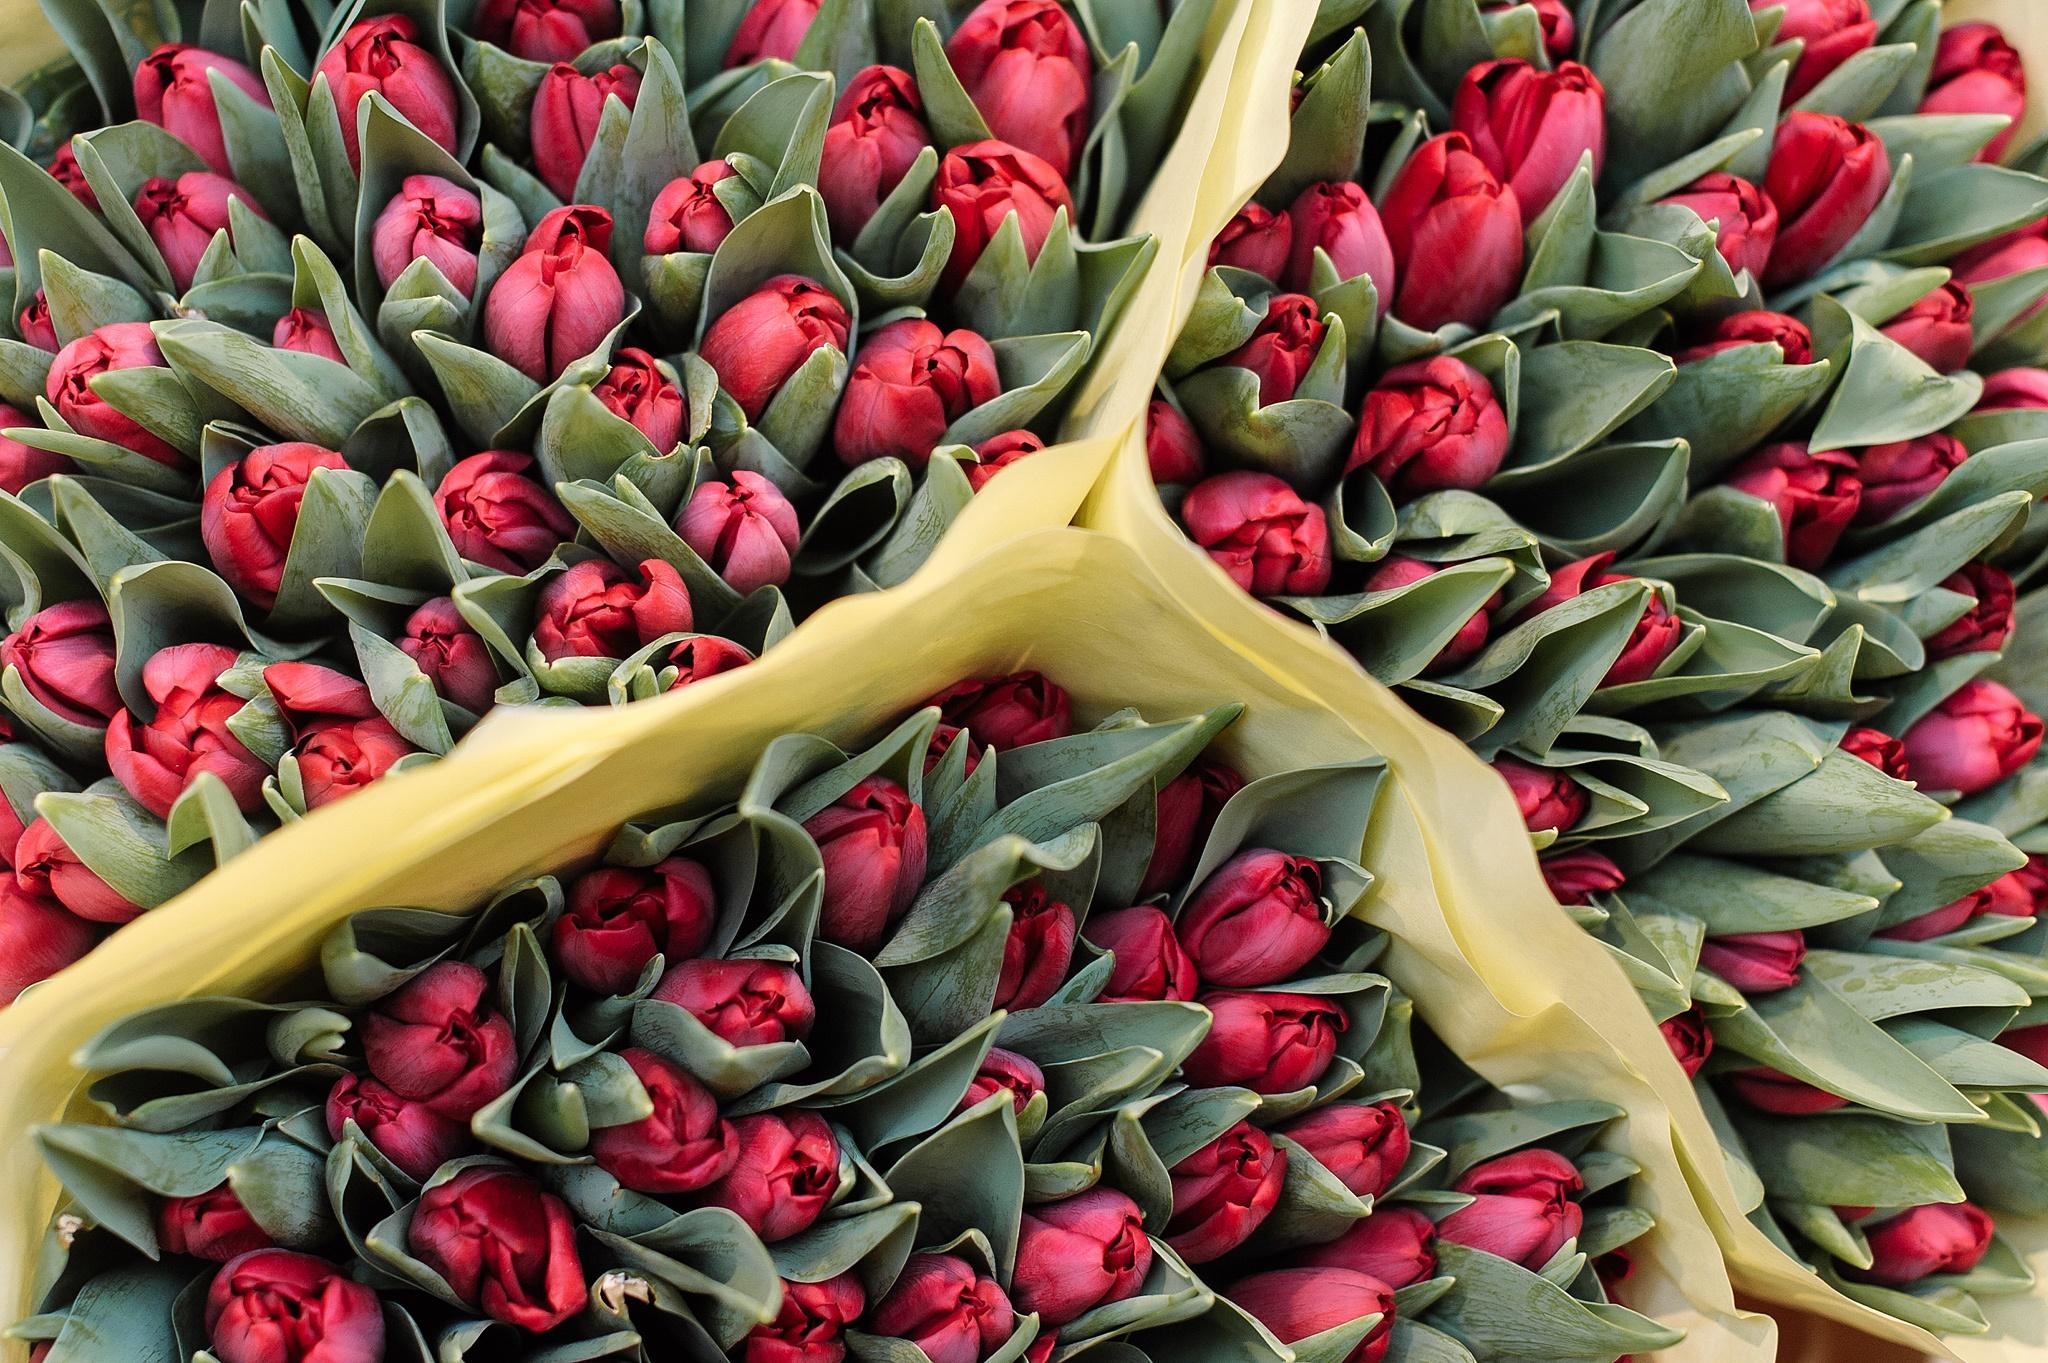 Сколько стоят тюльпаны на Цветочном рынке Амстердама?